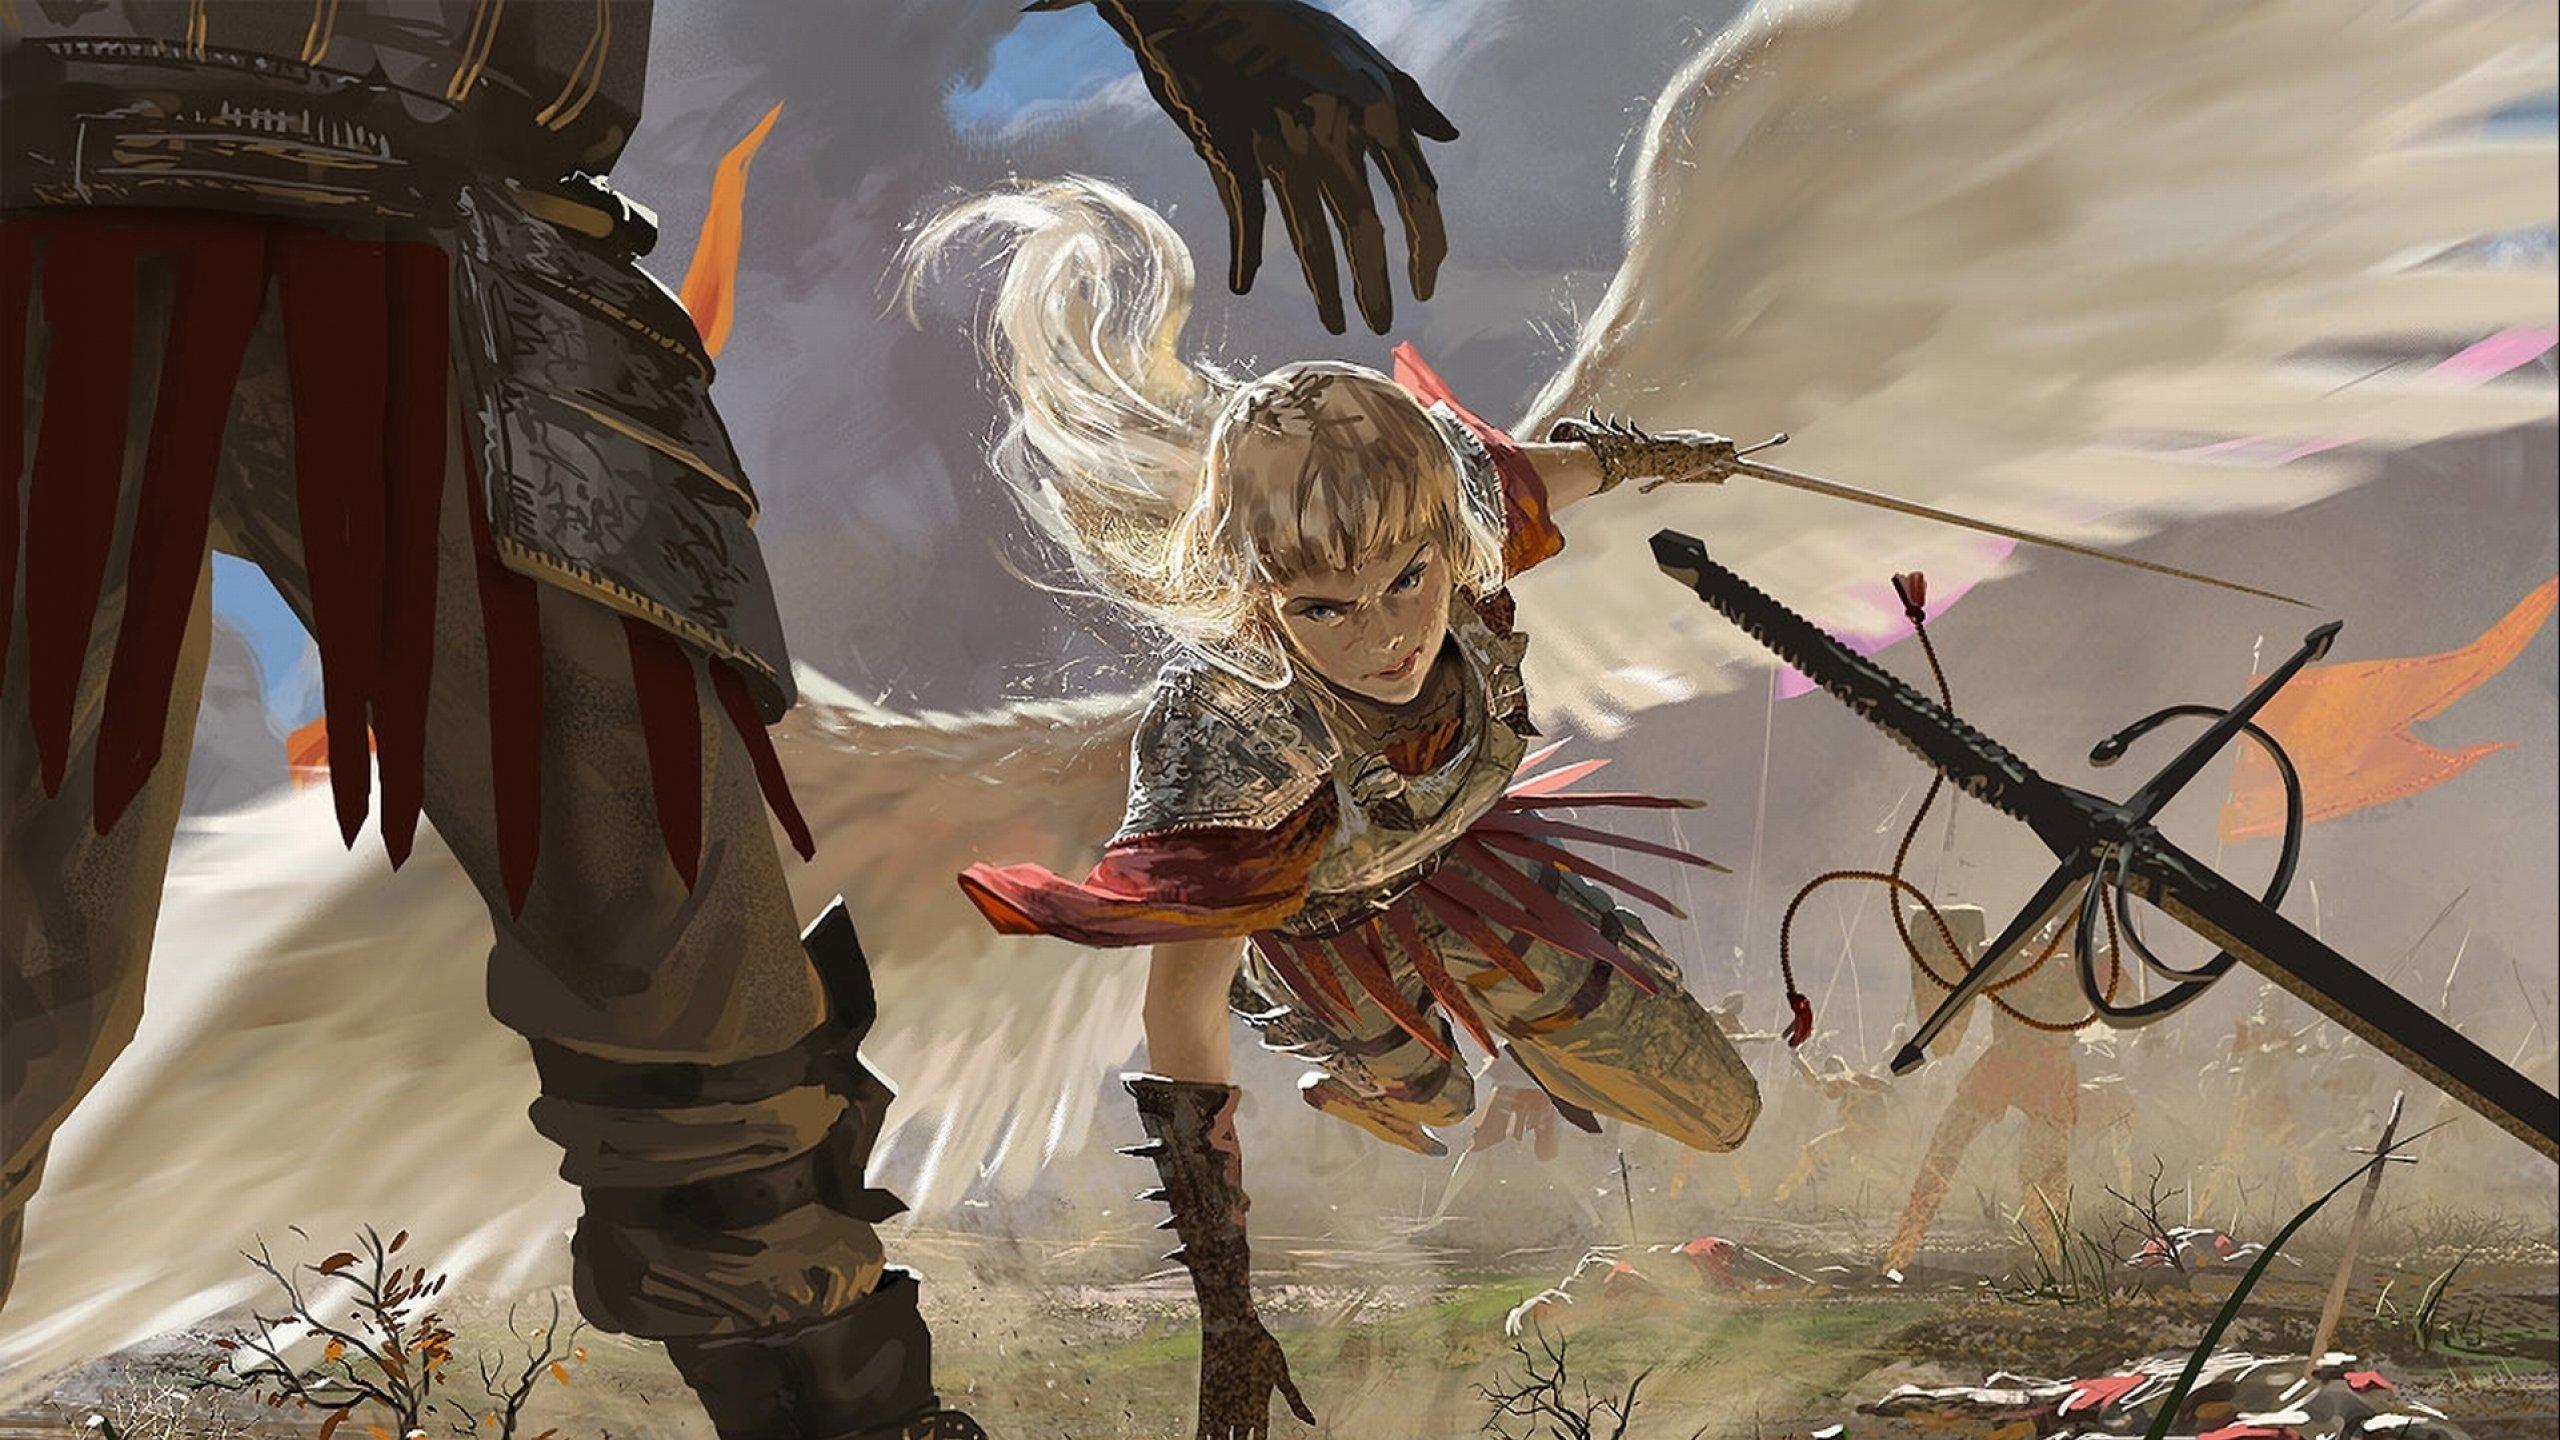 Warrior Fantasy Art Armor Angel Magic Wallpapers Hd: Fantasy Angel Warrior Artwork Art Wallpaper